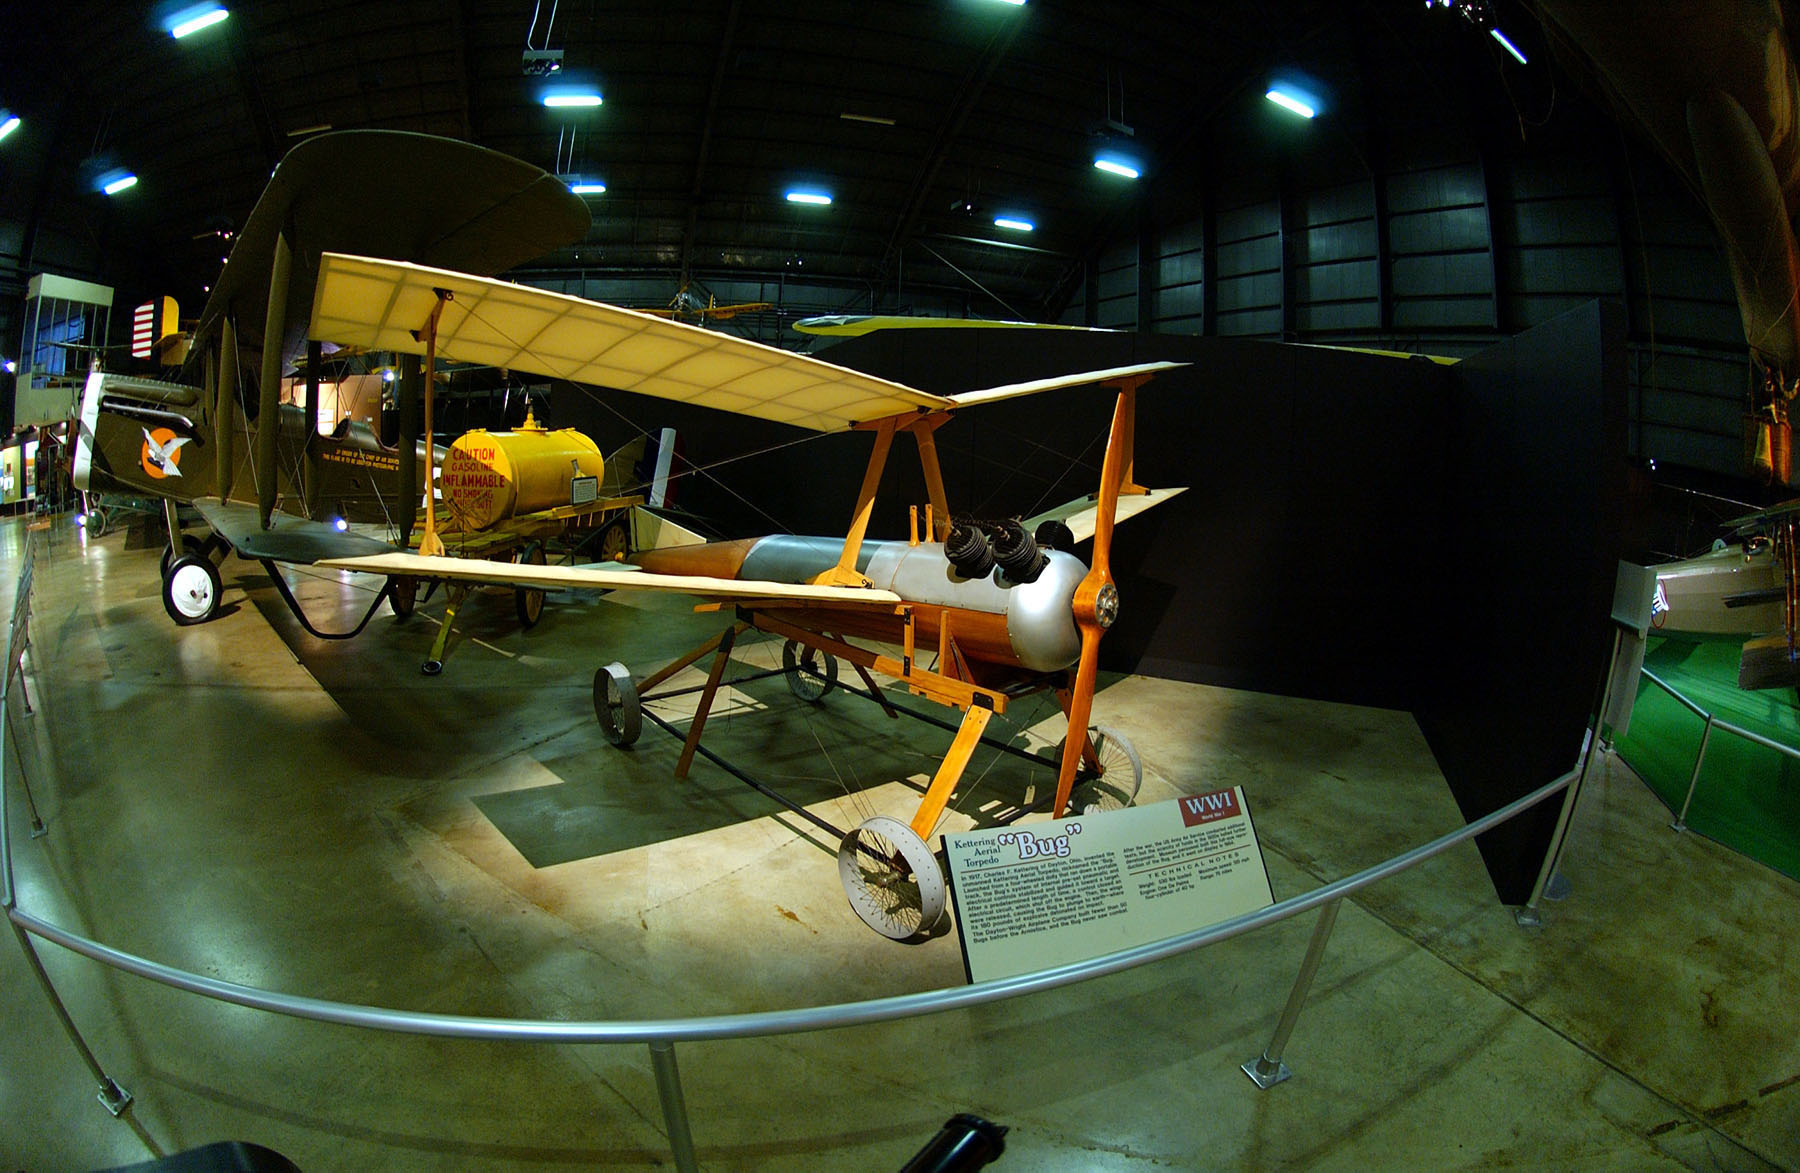 Kettering Bug Kettering_Aerial_Torpedo_Bug_USAF